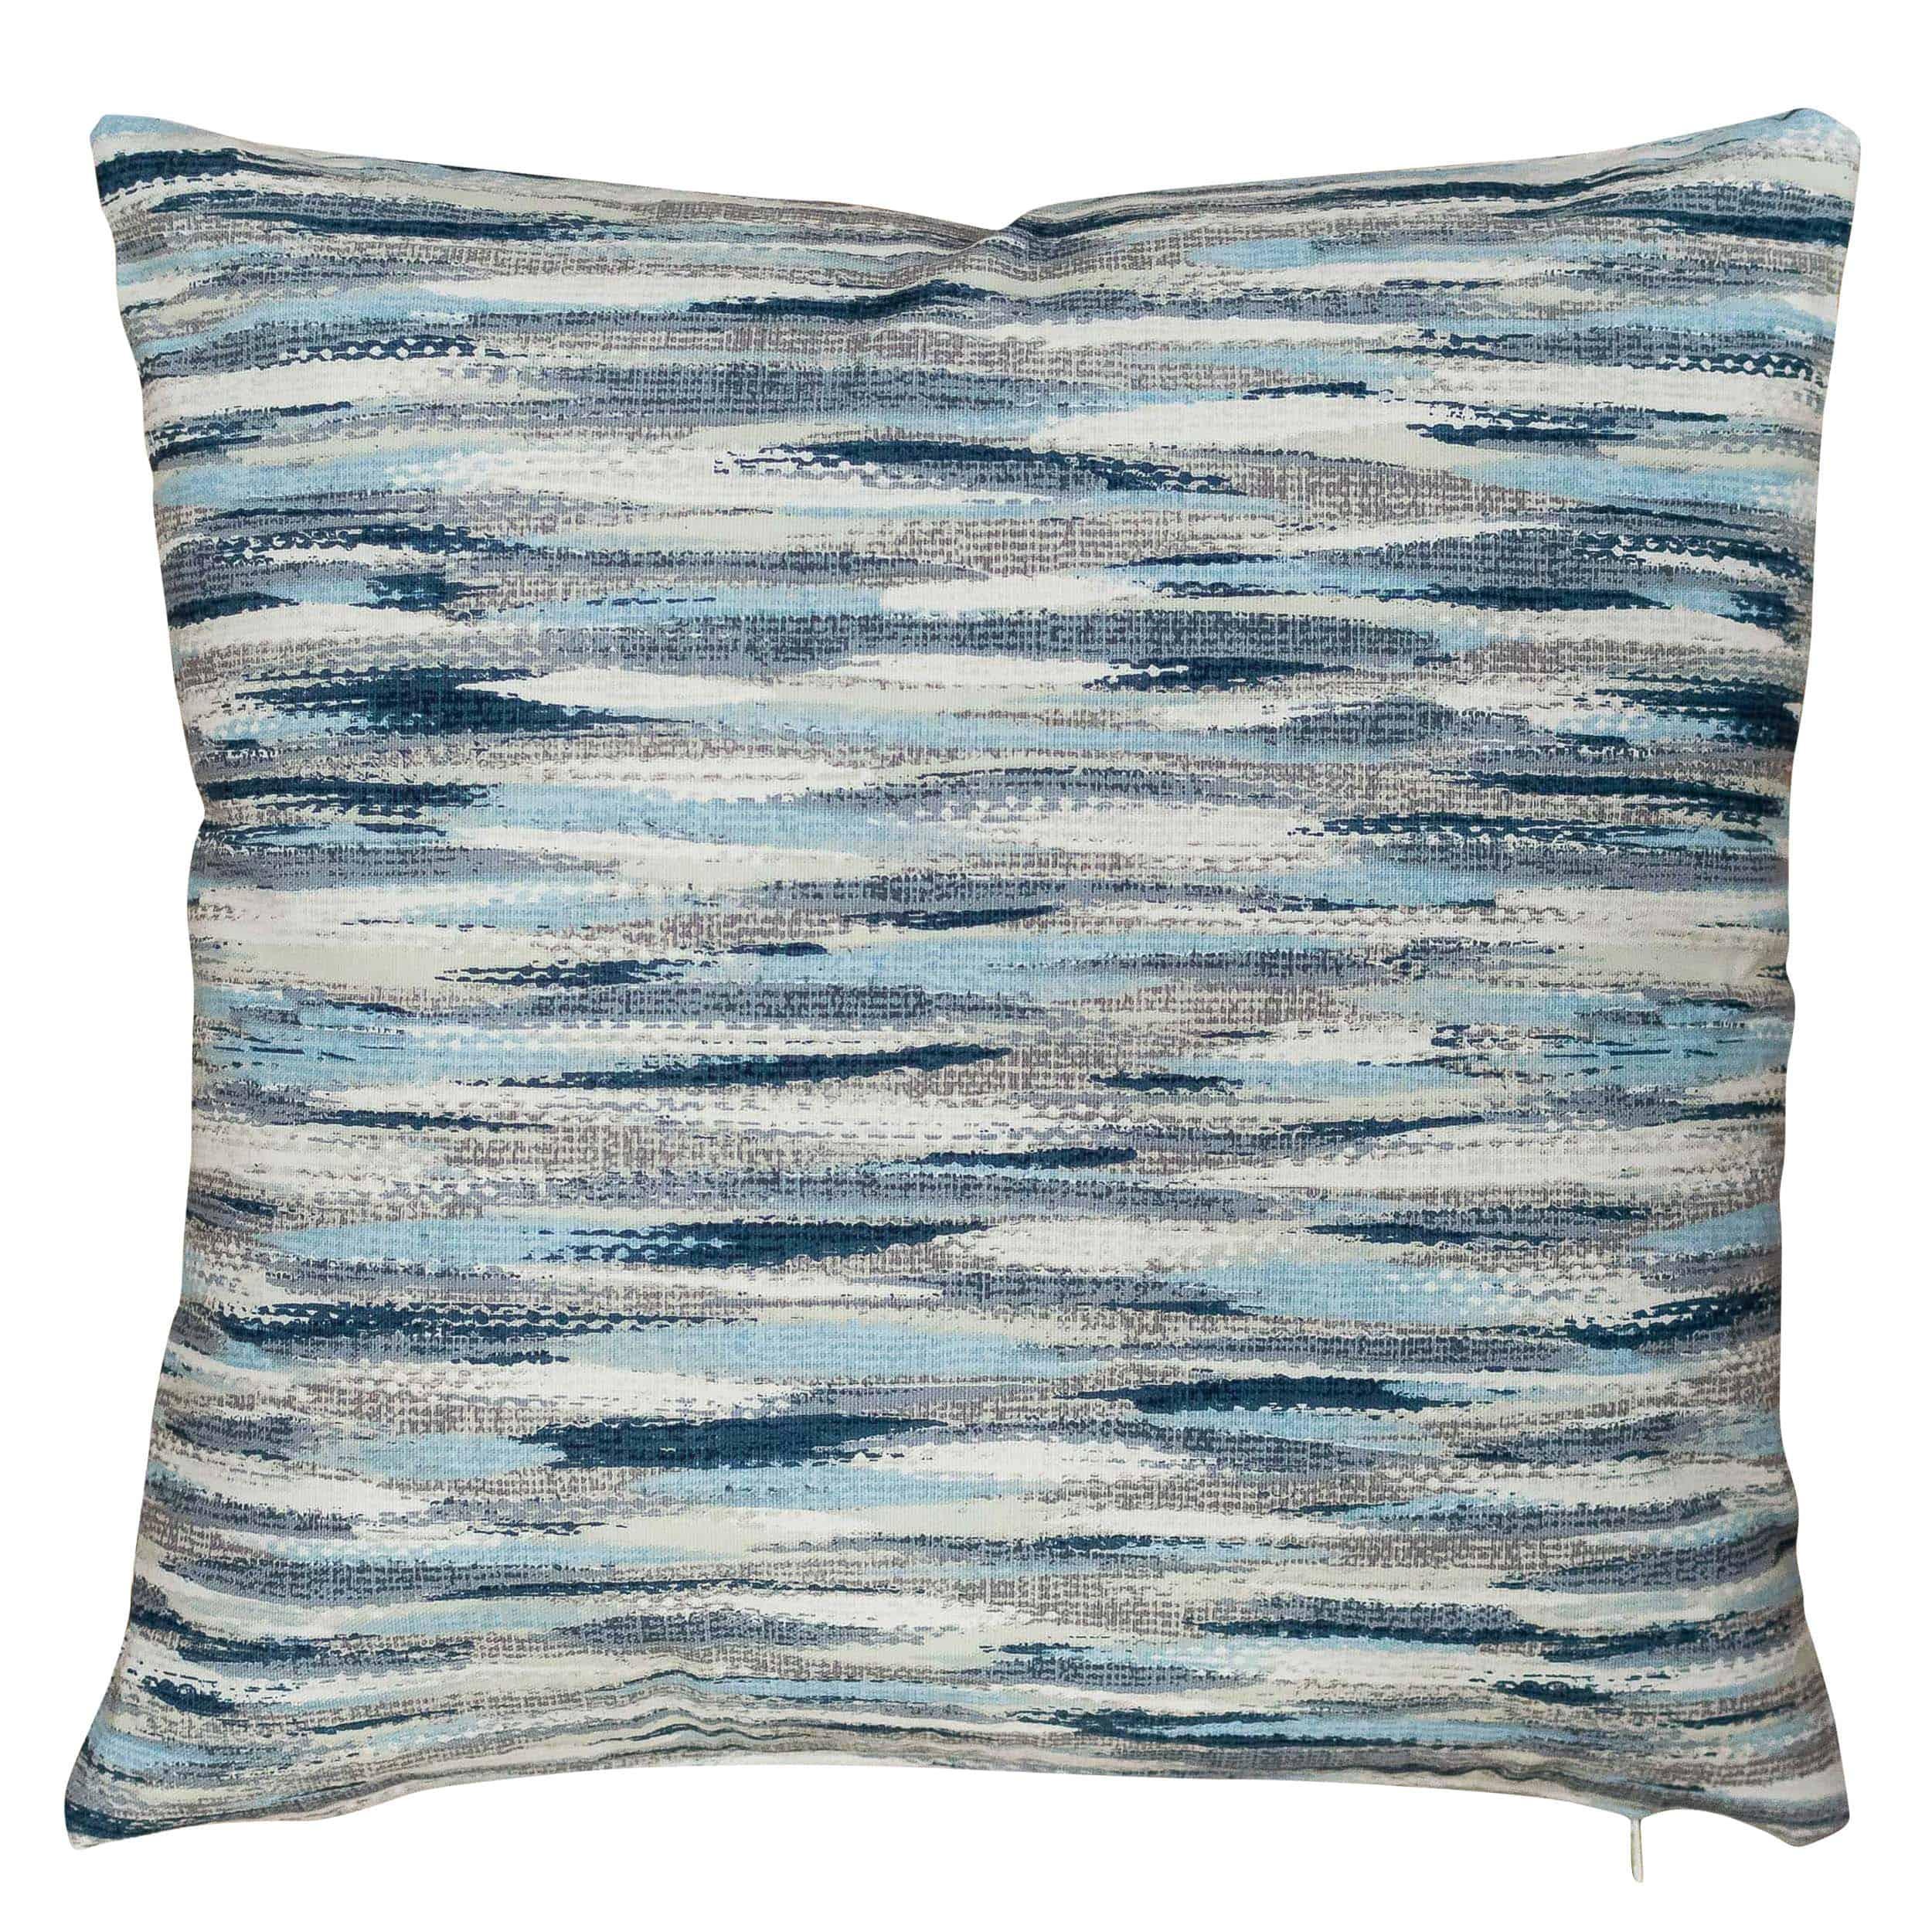 Abstract Seascape Cushion